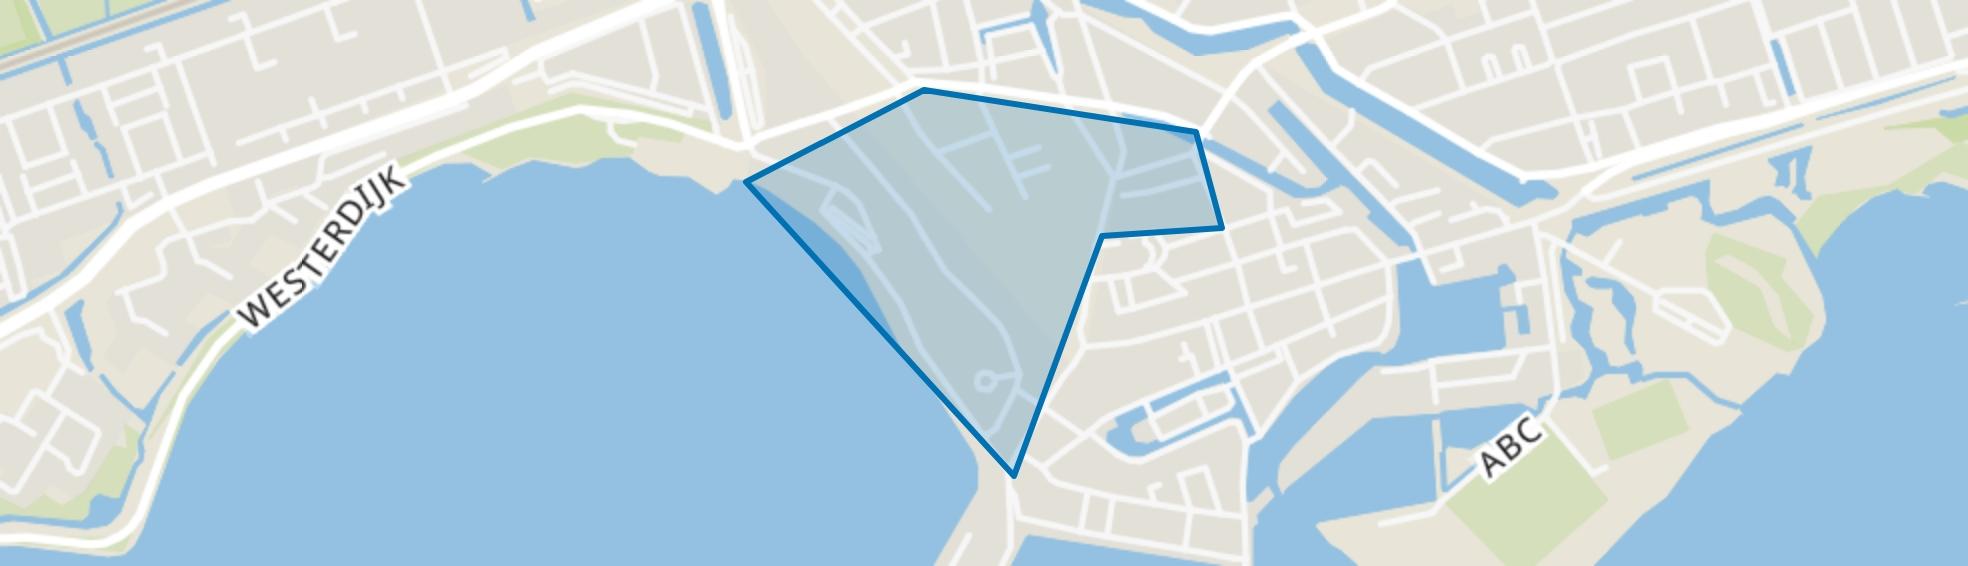 Binnenstad - Buurt 10 02, Hoorn (NH) map